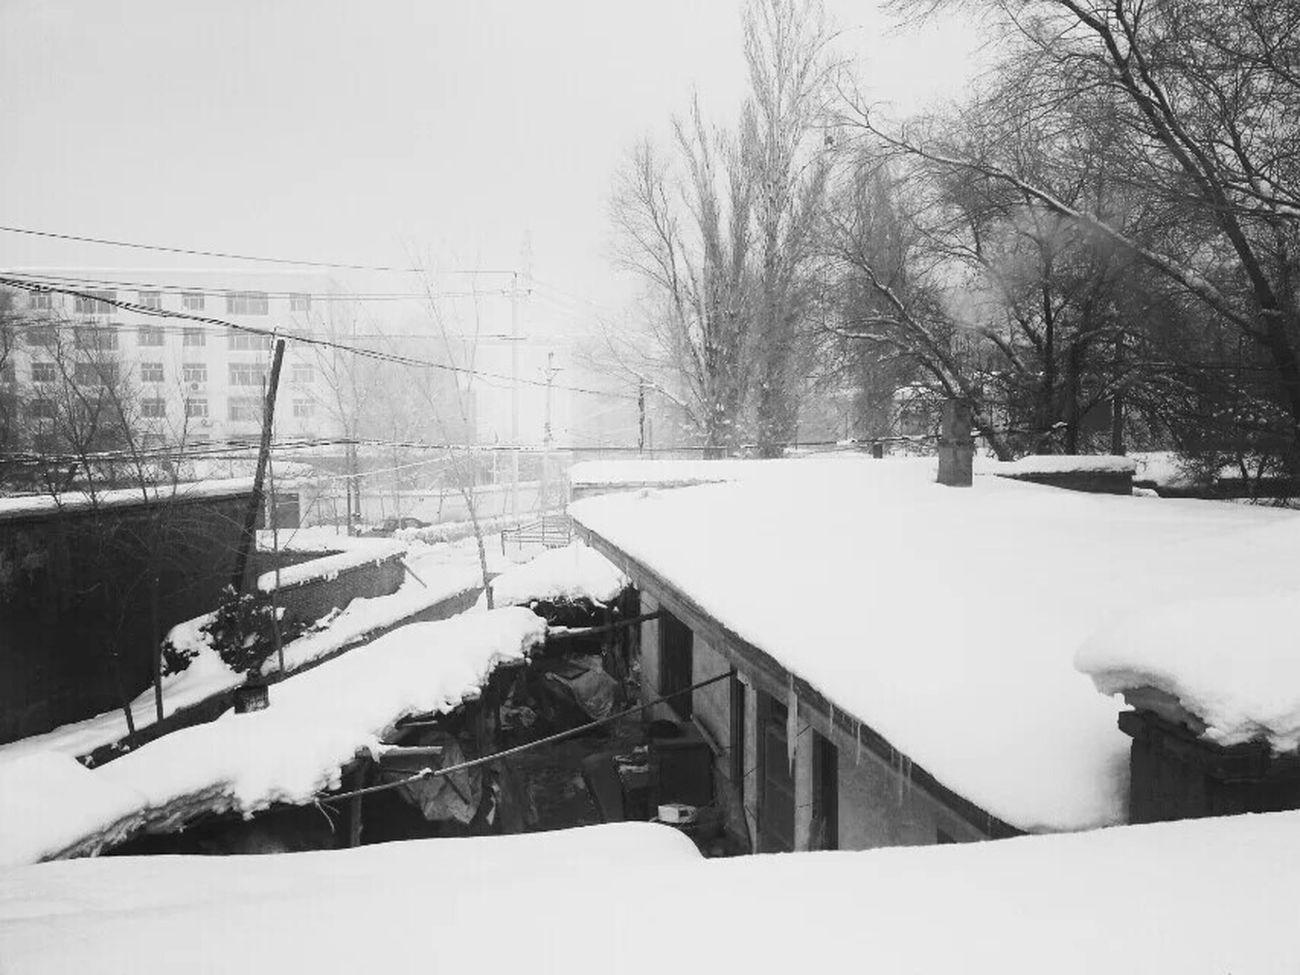 Snow ❄ 乌鲁木齐 Black & White Taking Photos Beautiful ♥ Enjoying Life EyeEm The Best Shots Eye For Photography Have A Nice Day♥ Happy Day